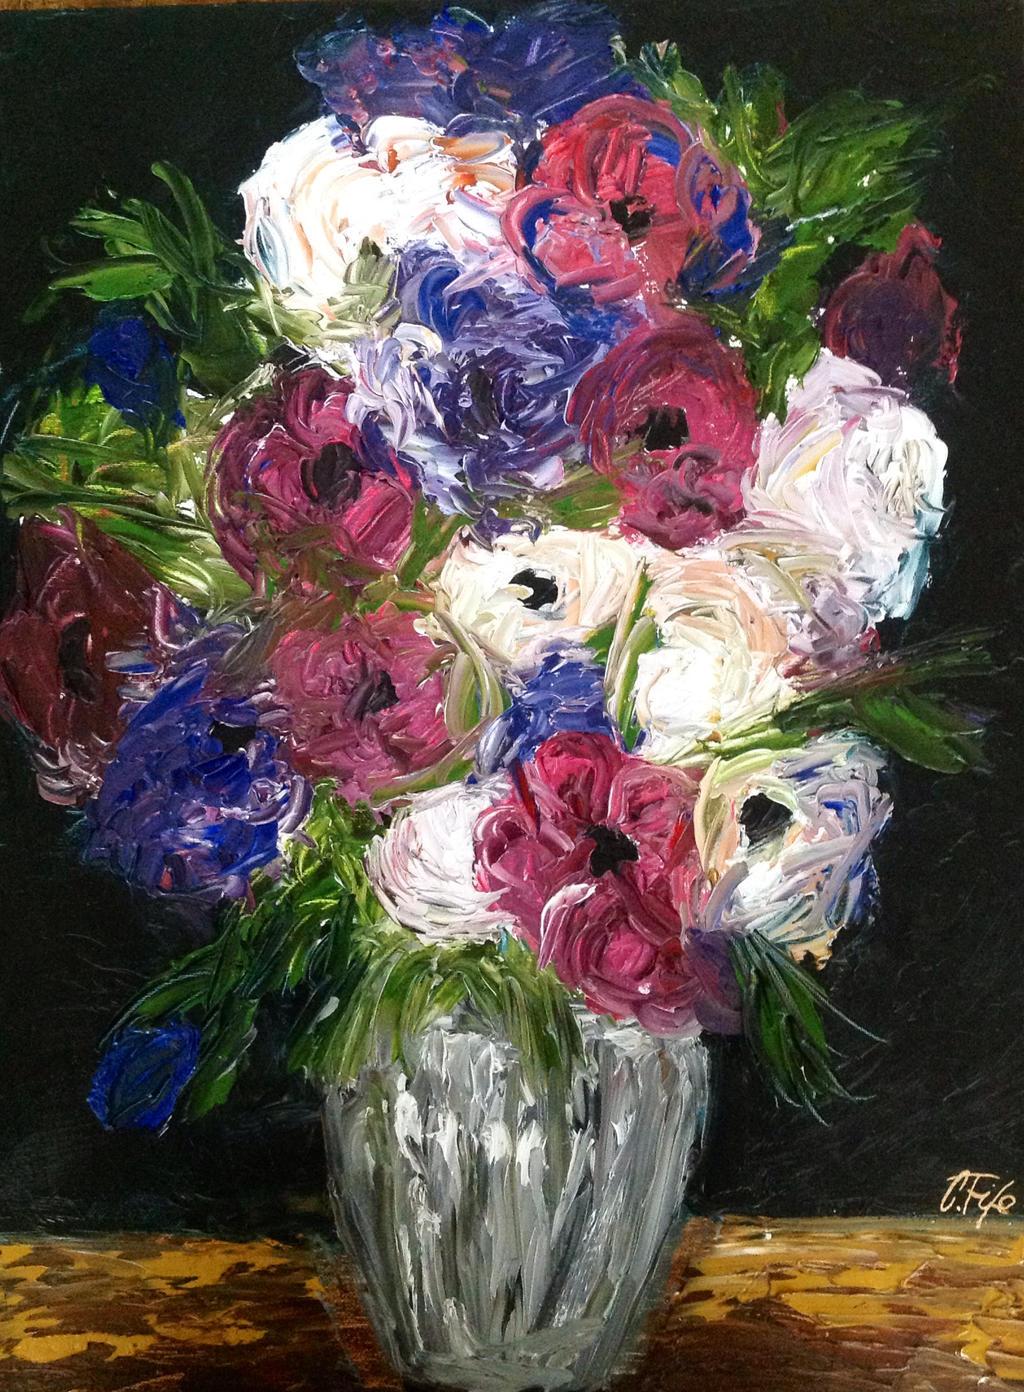 Dark Flowers Oil Painting Ctfife By Cfife On Deviantart